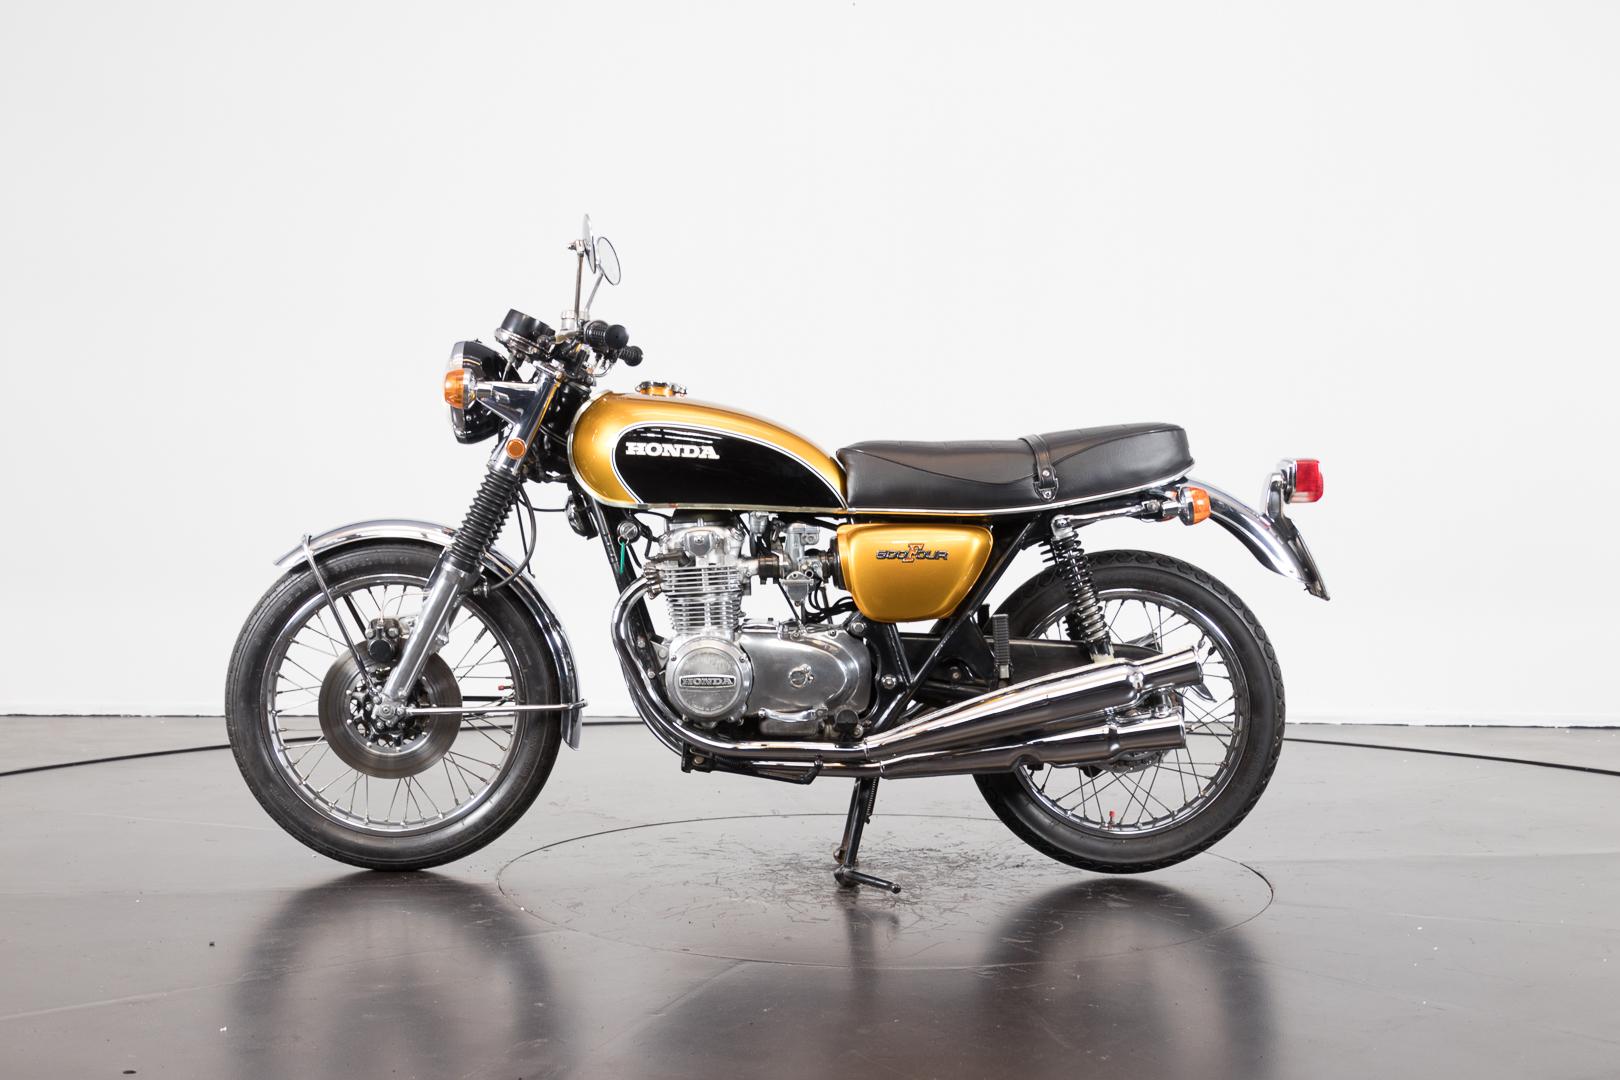 1972 honda cb 500 honda moto d 39 epoca ruote da sogno. Black Bedroom Furniture Sets. Home Design Ideas